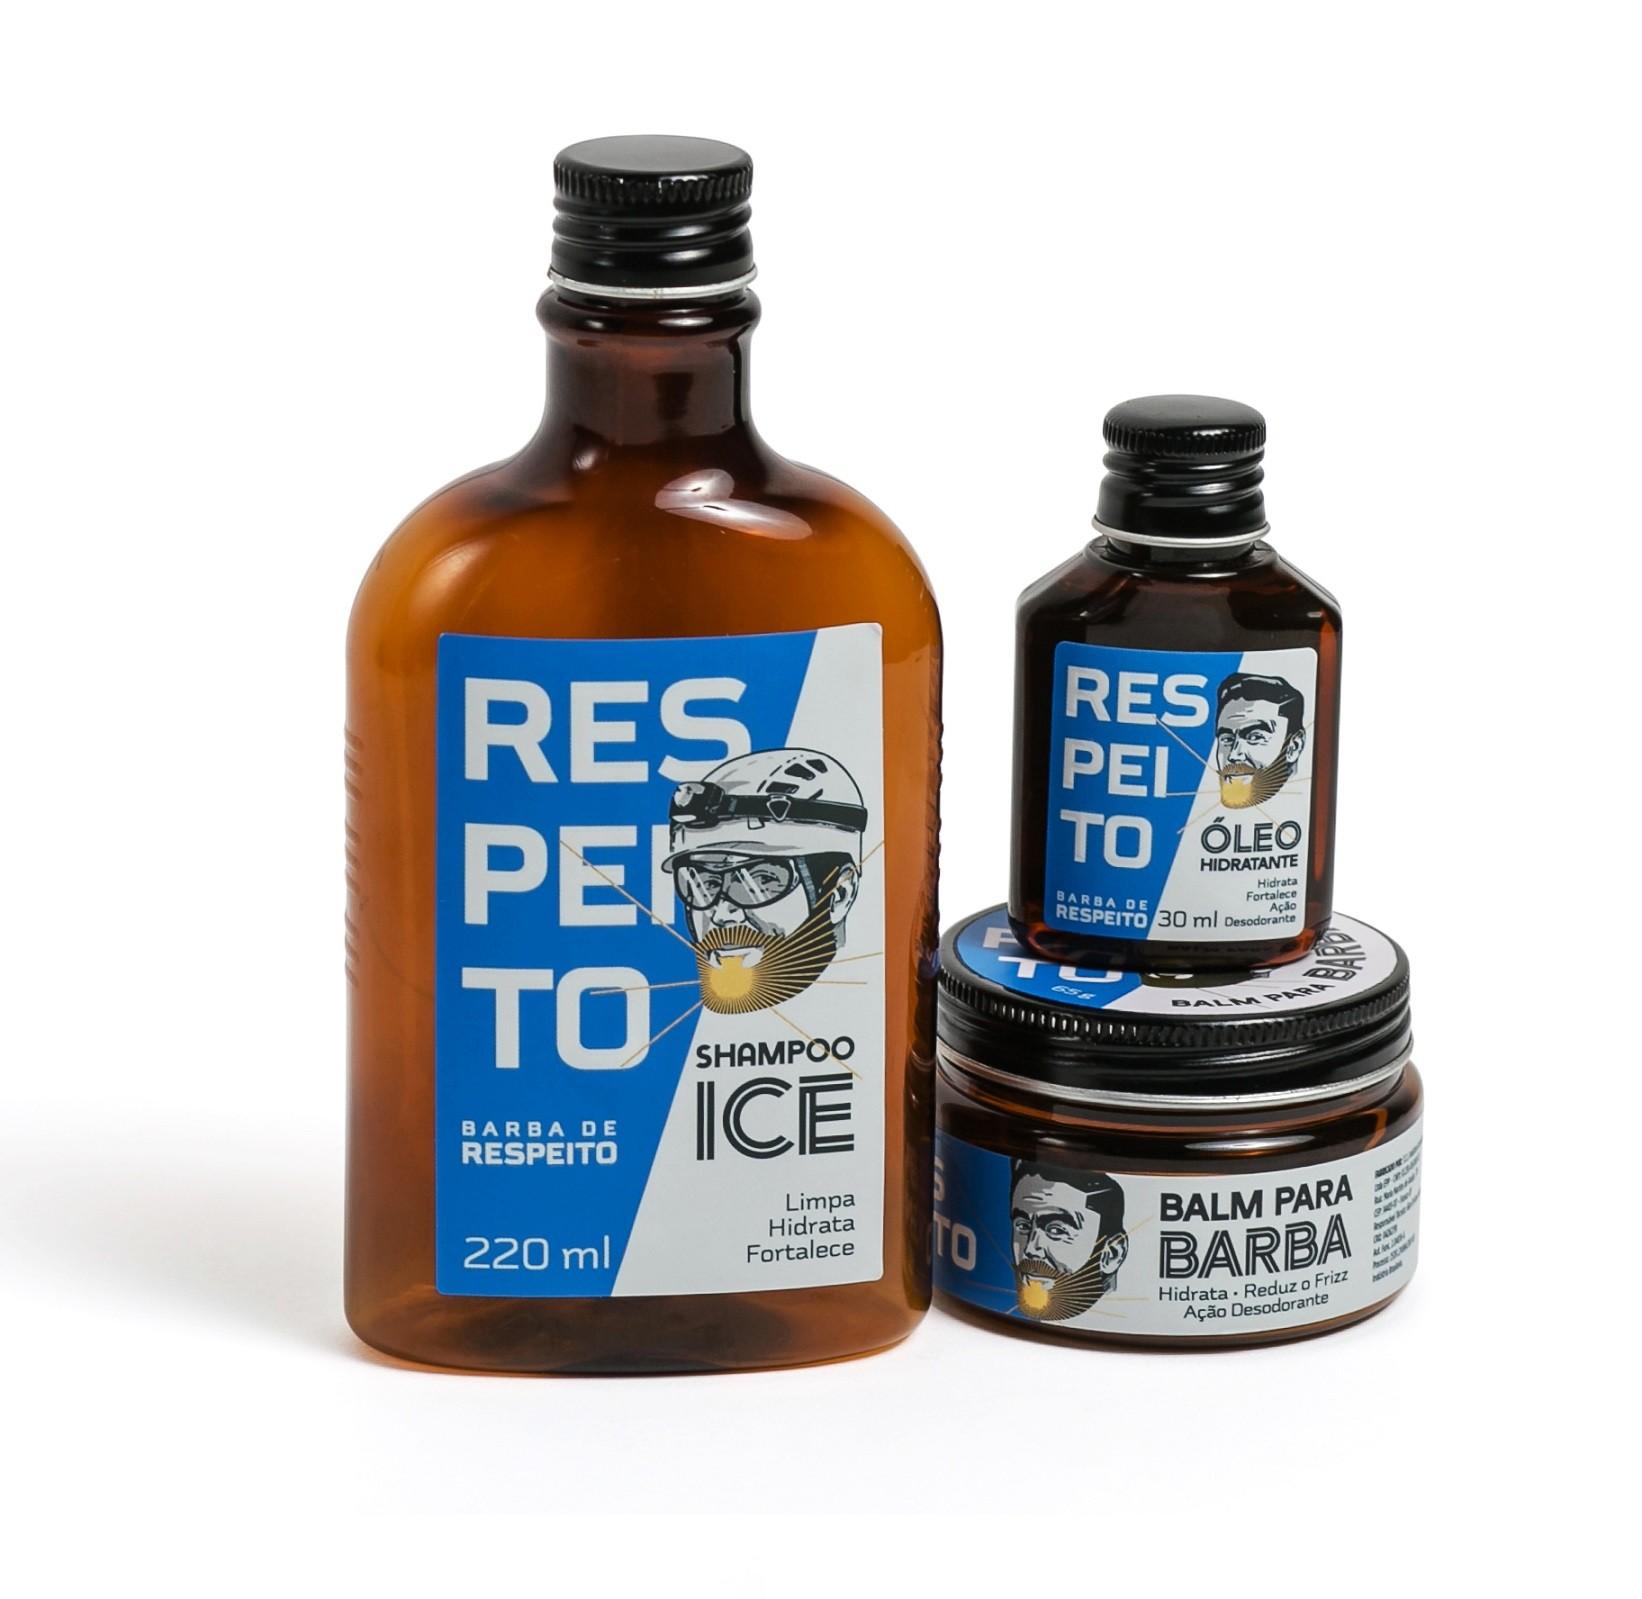 Kit Ice - Barba de Respeito